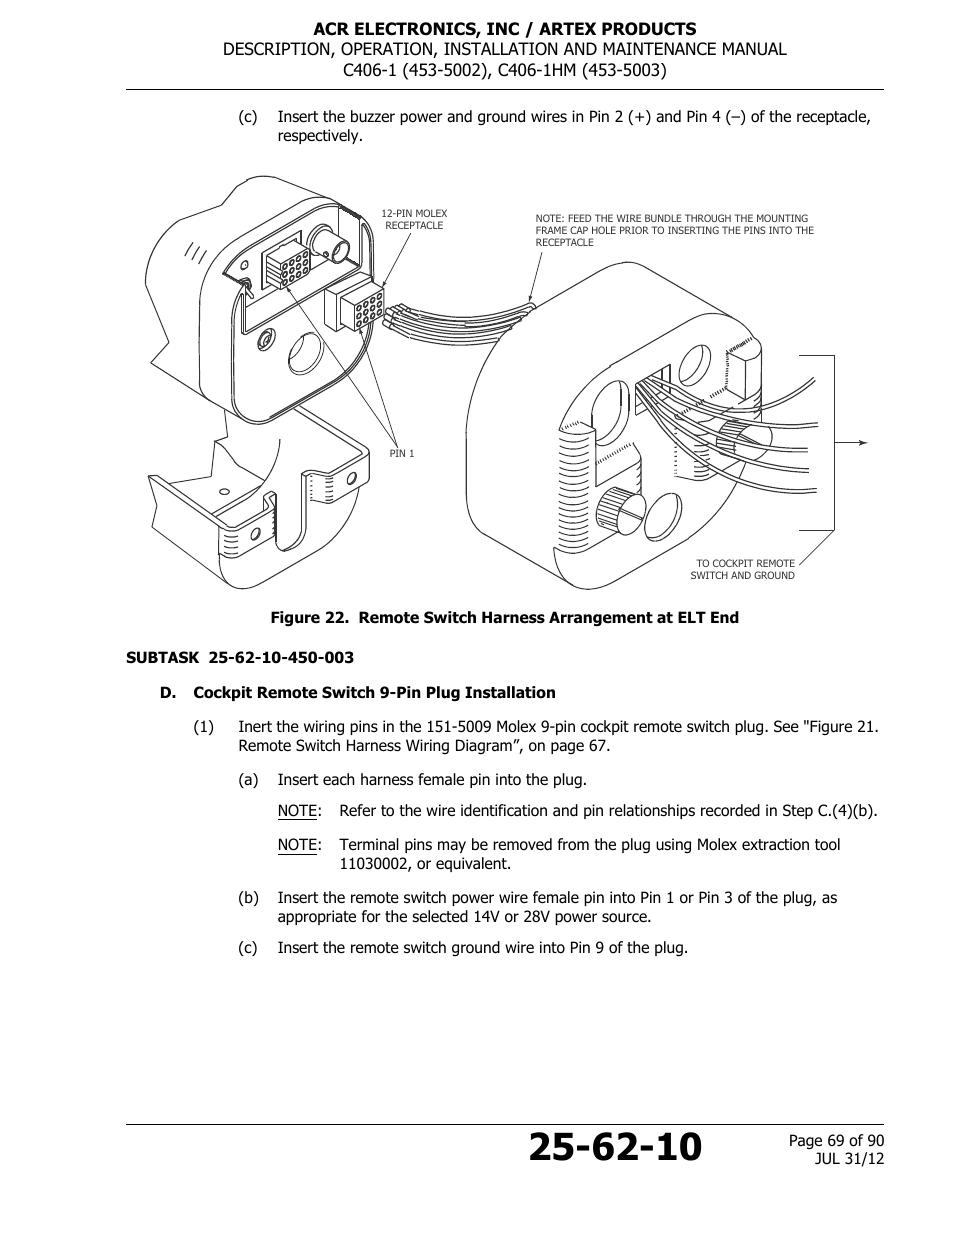 hight resolution of pin to wiring diagram on 15 pin connector diagram vga pin diagram